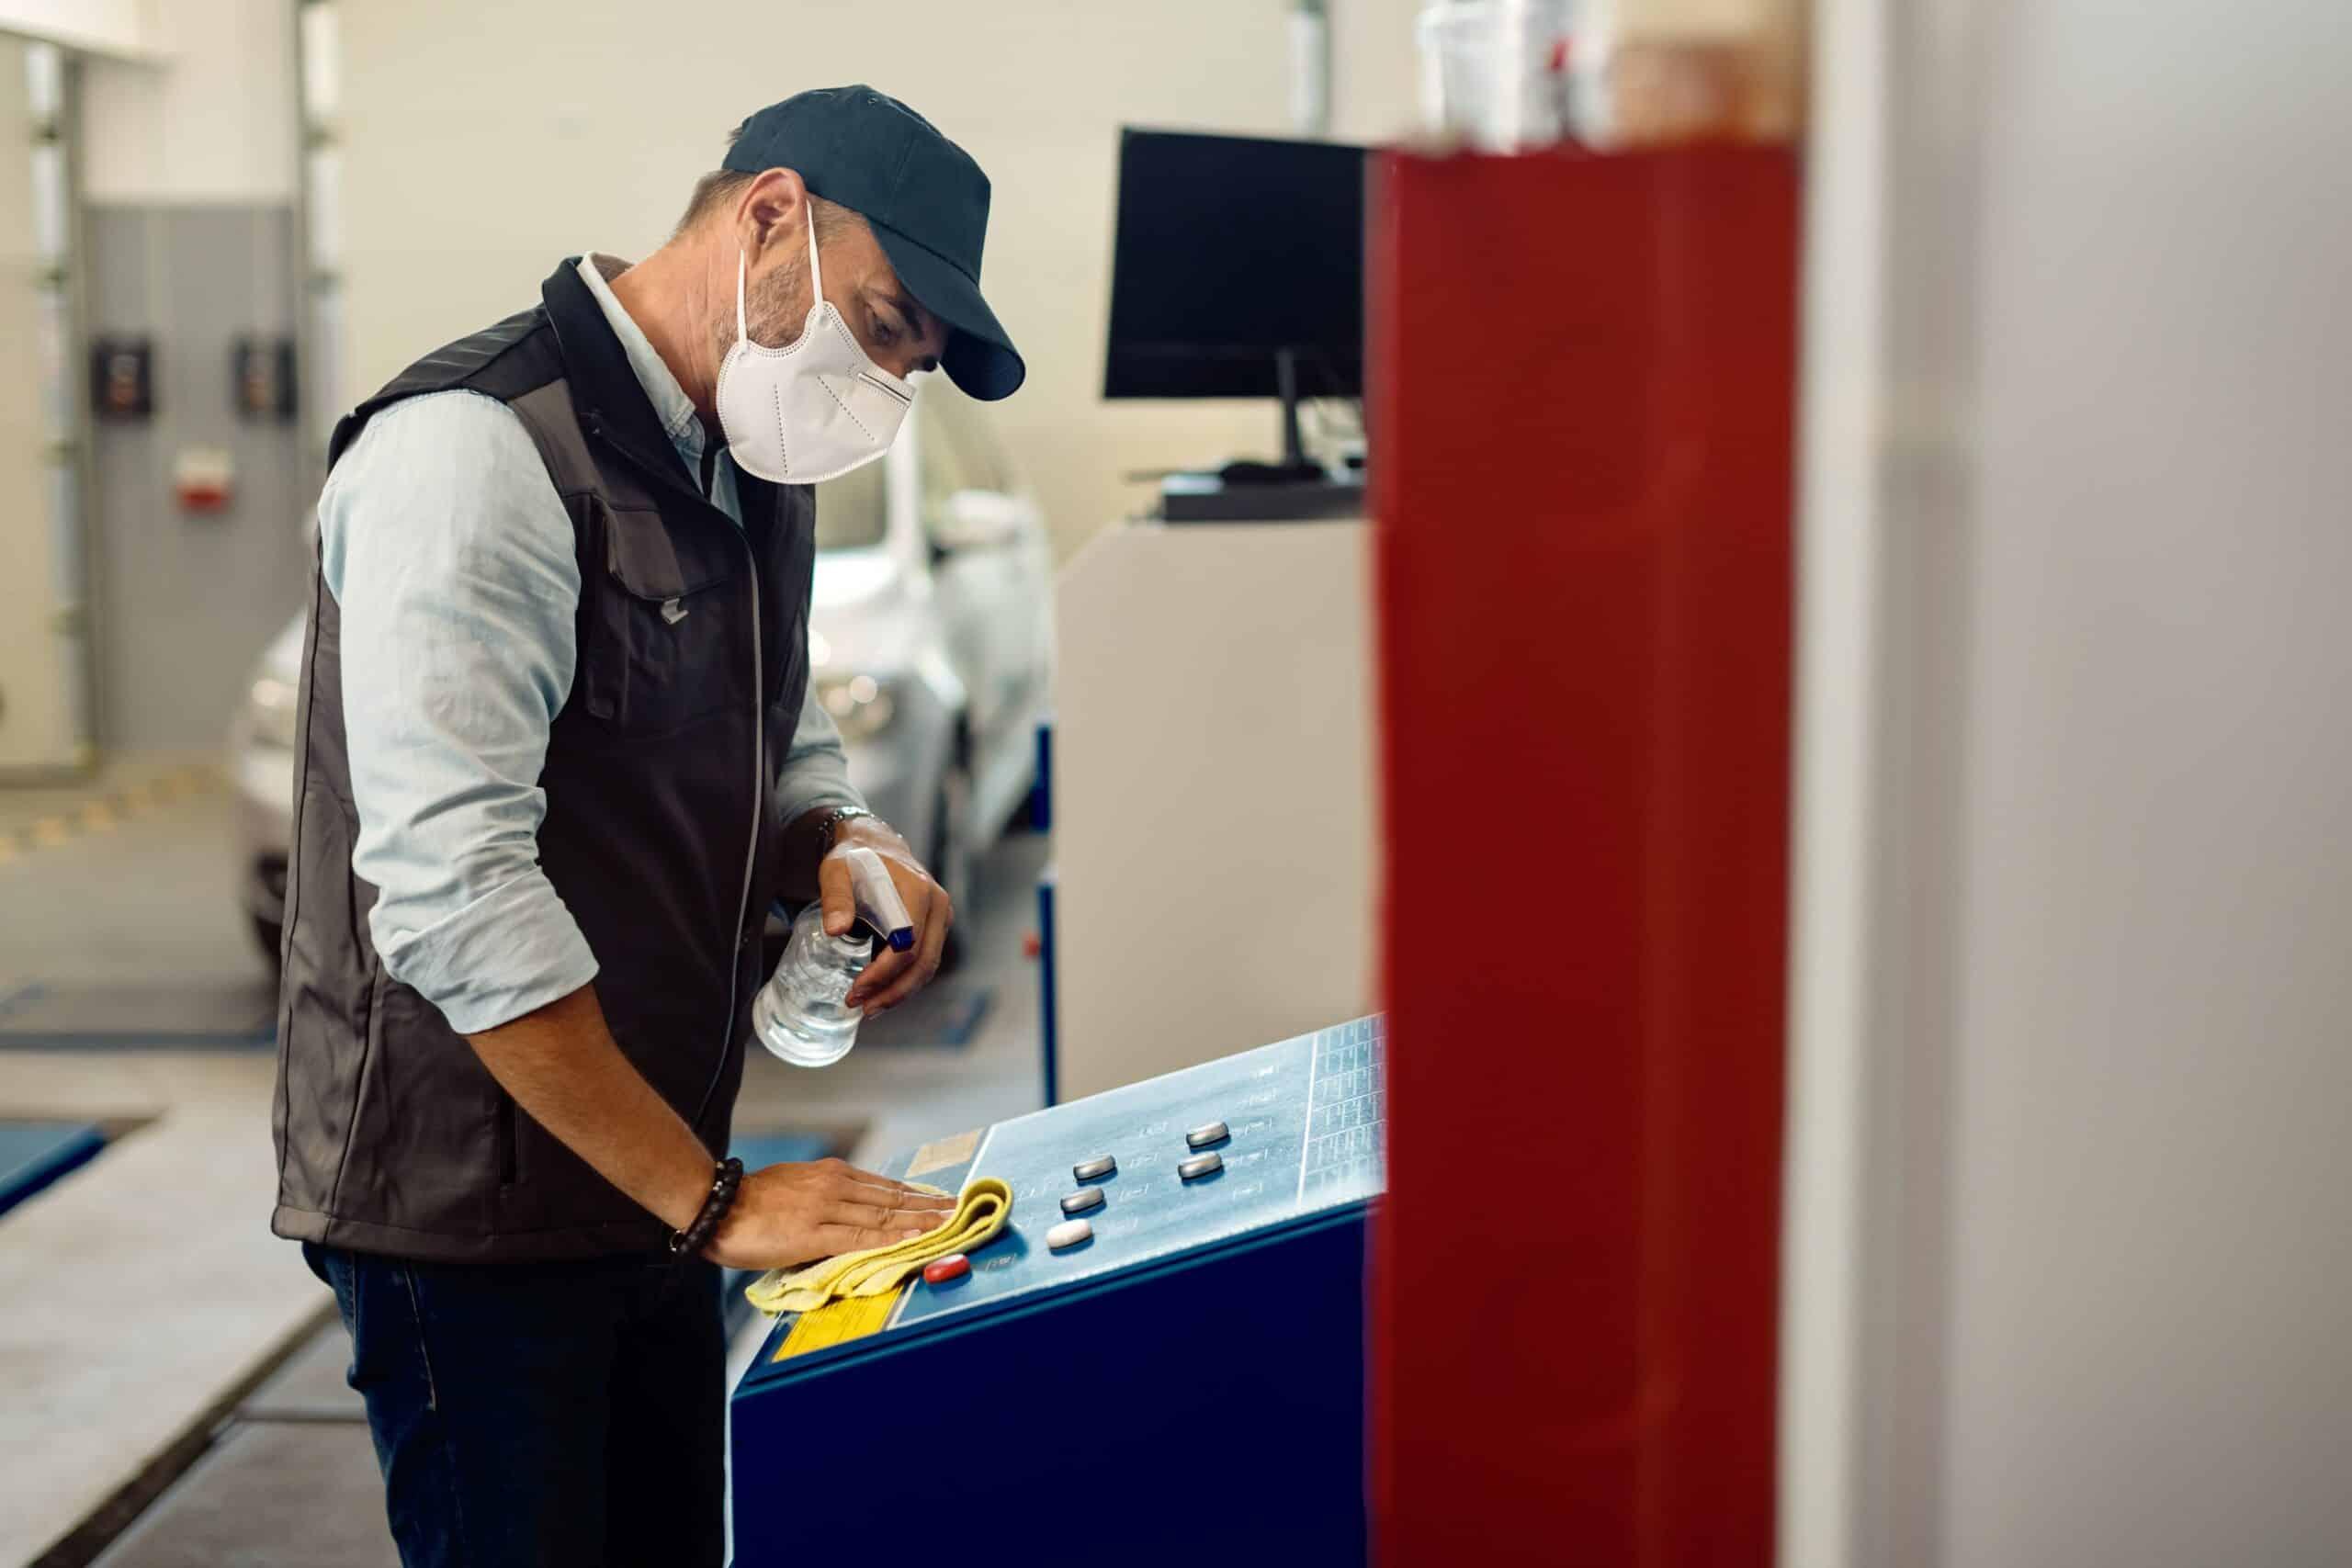 Maintenance worker cleaning equipment